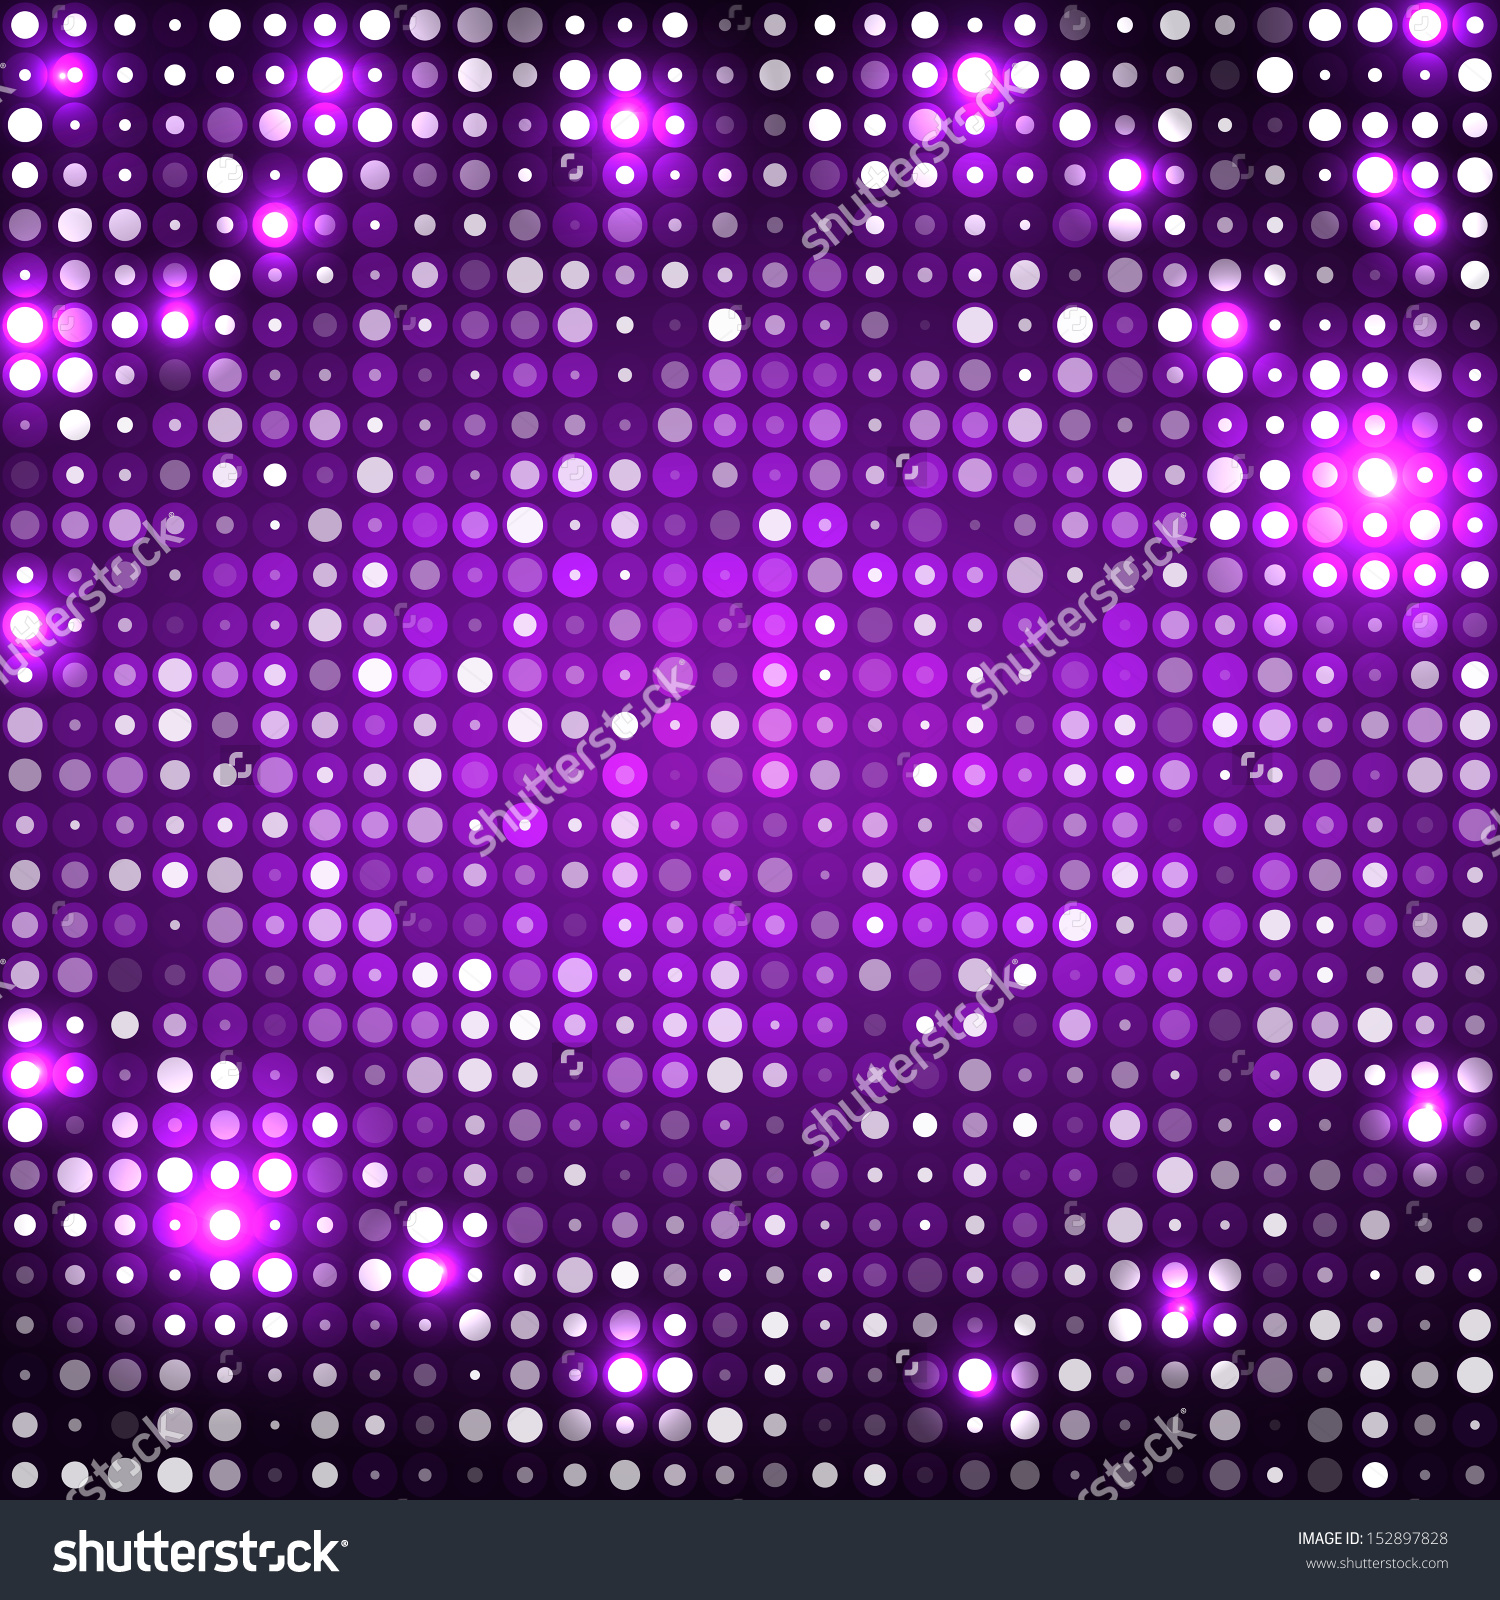 Dark purple abstract clipart.